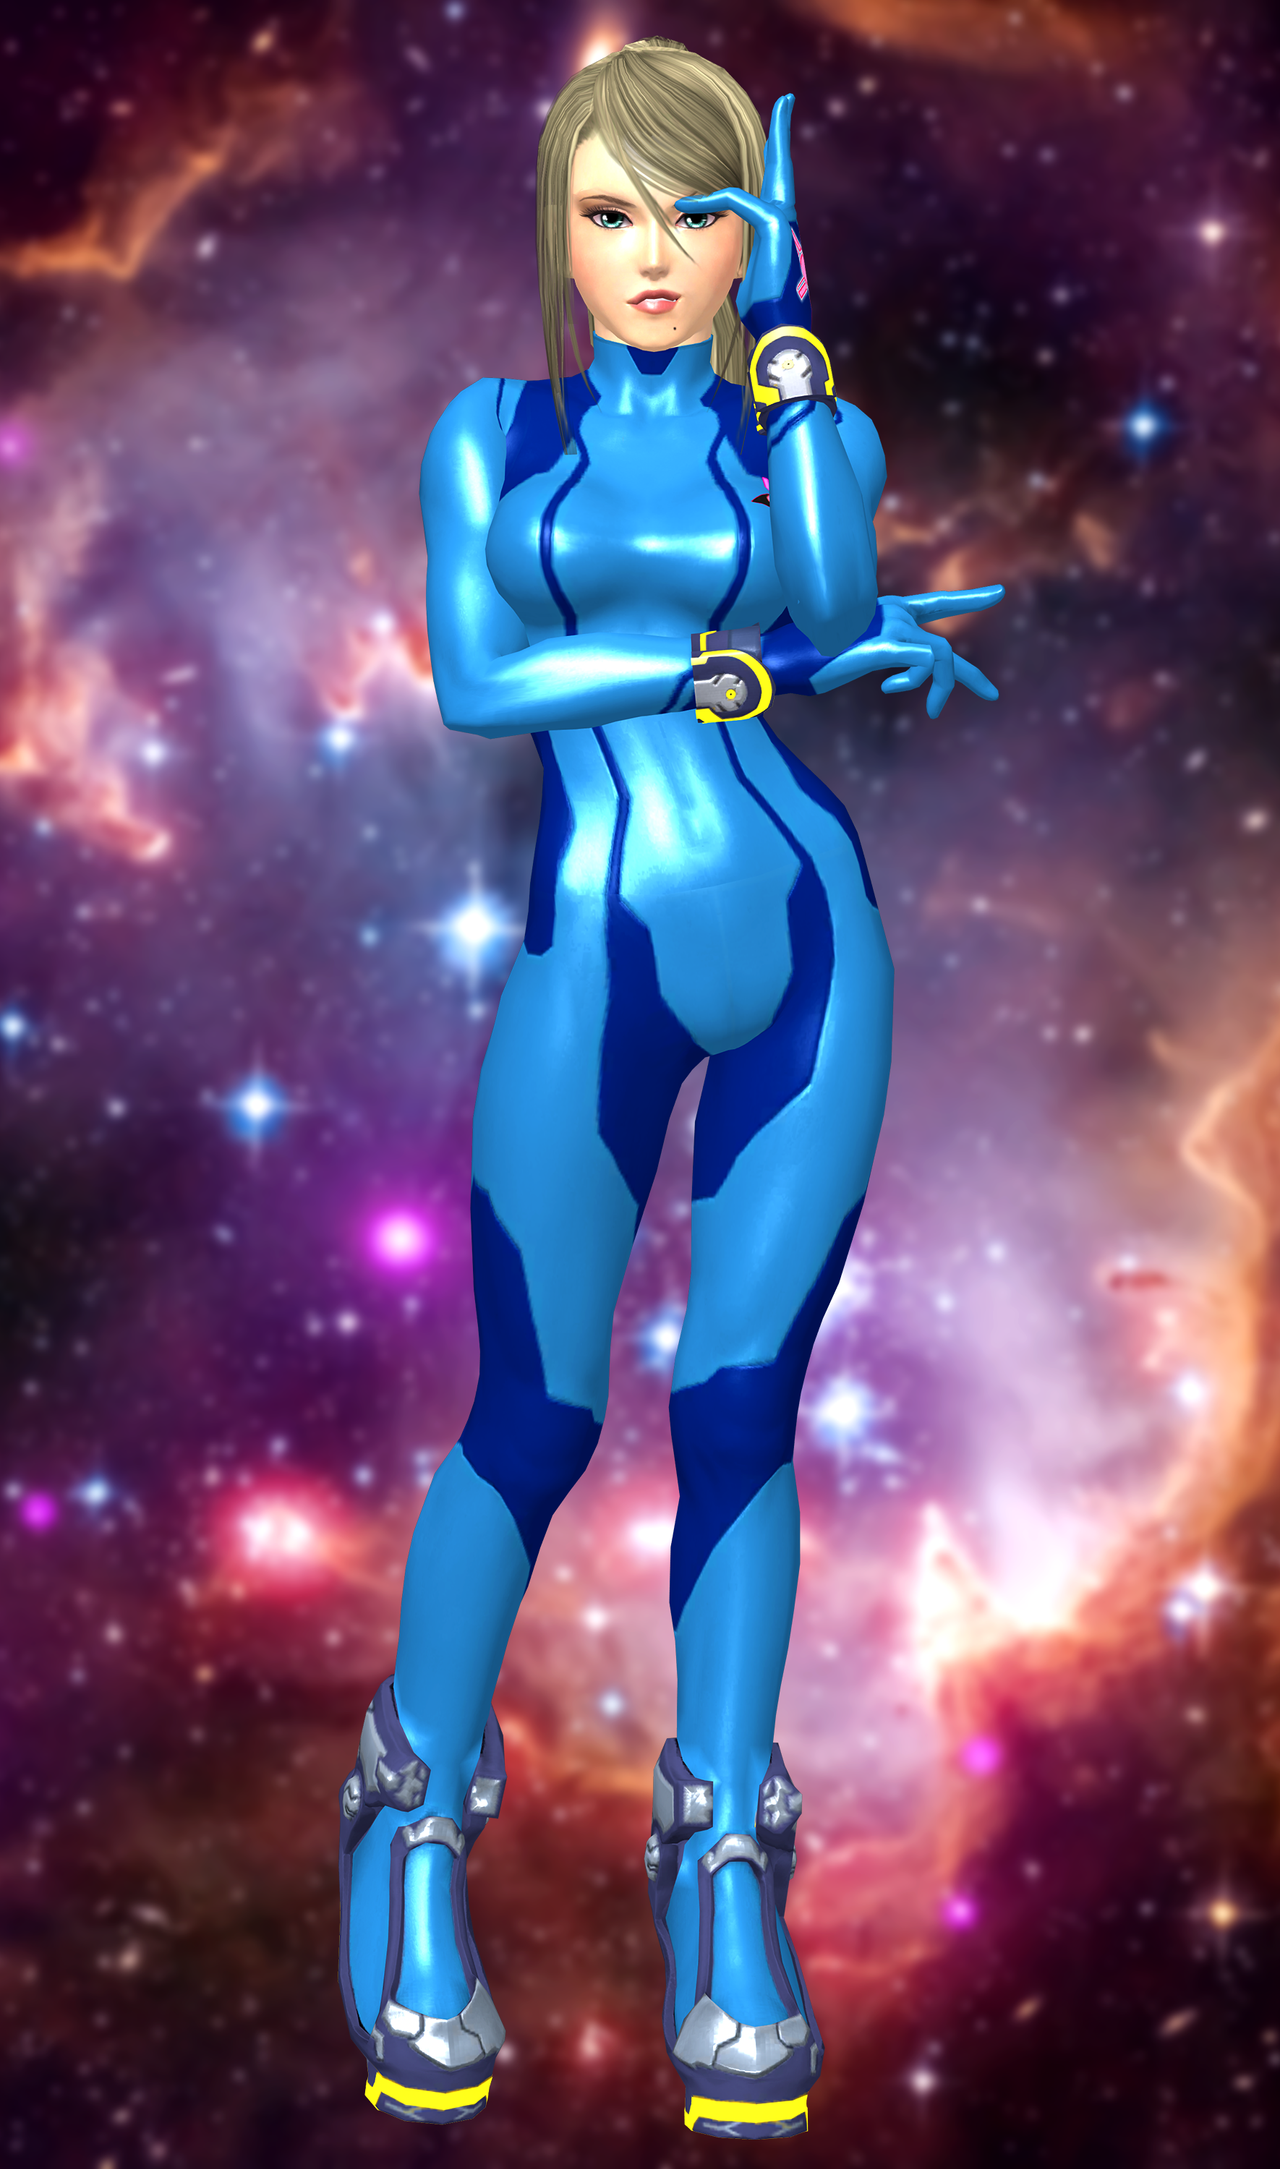 Sexy zero suit samus naked